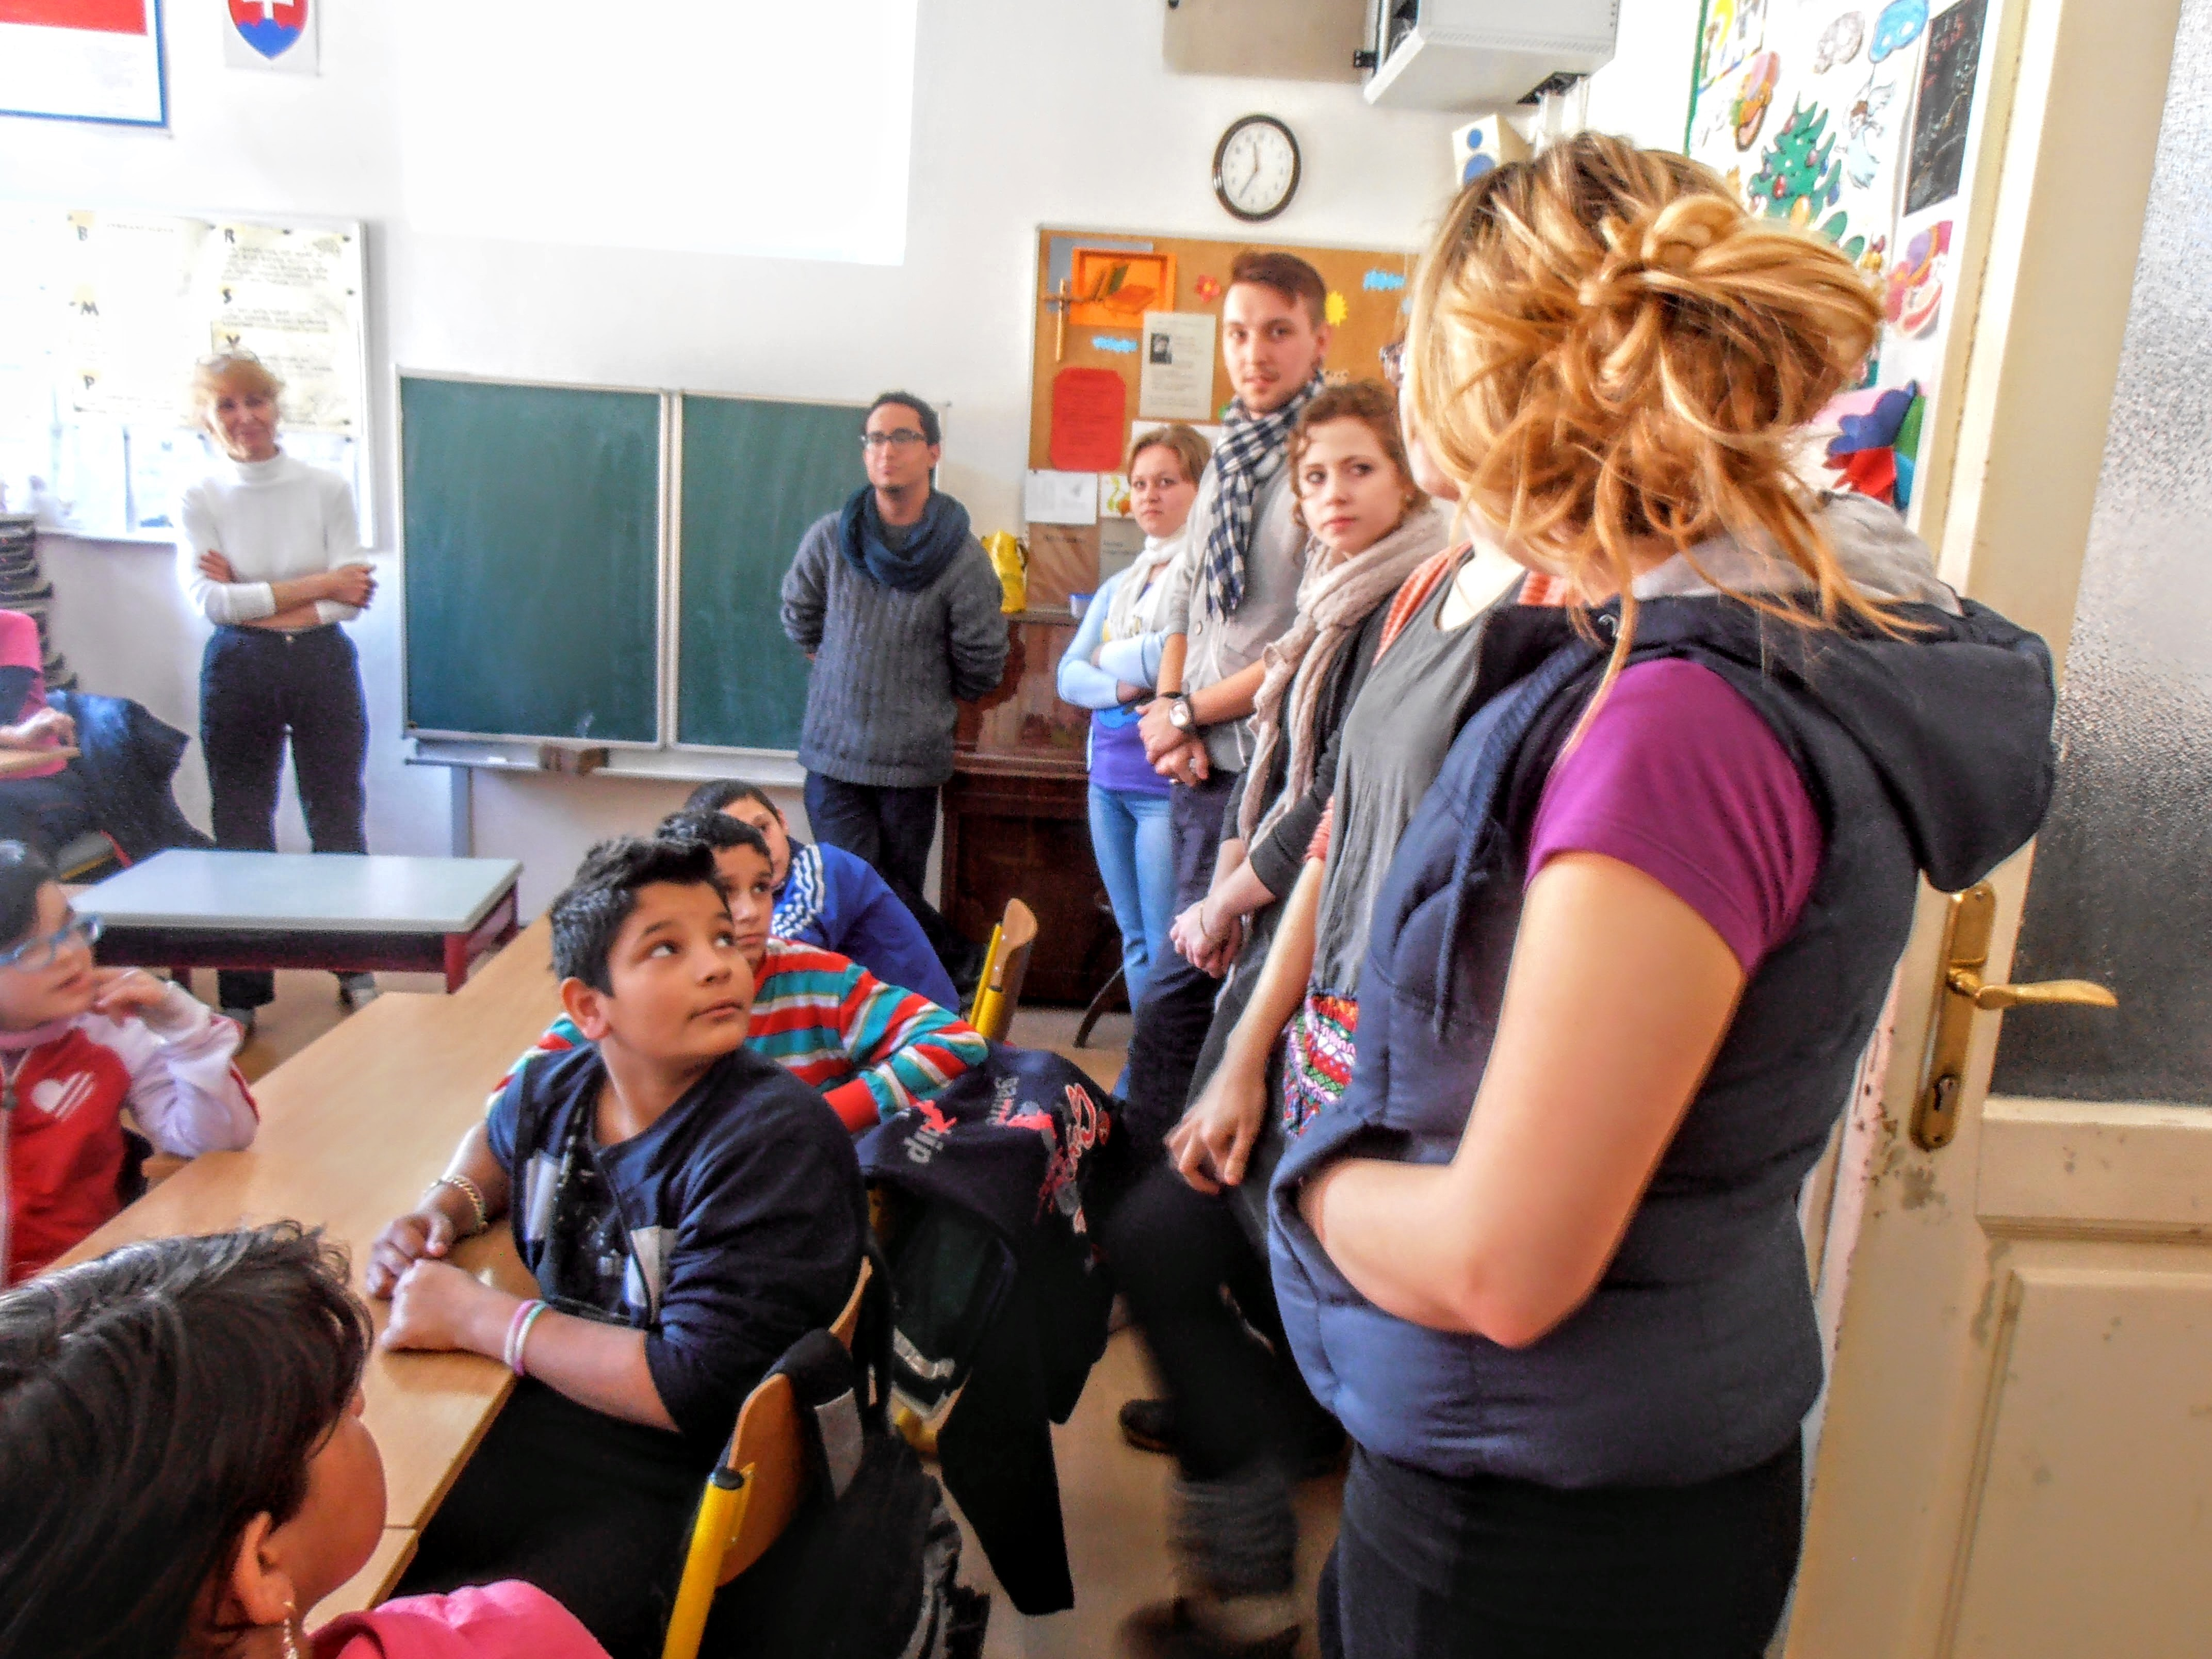 CAPAStudyAbroad_William_New_Interview_-_Beloit_College_students_at_Roma_elementary_school_Kremnica_SK.jpg